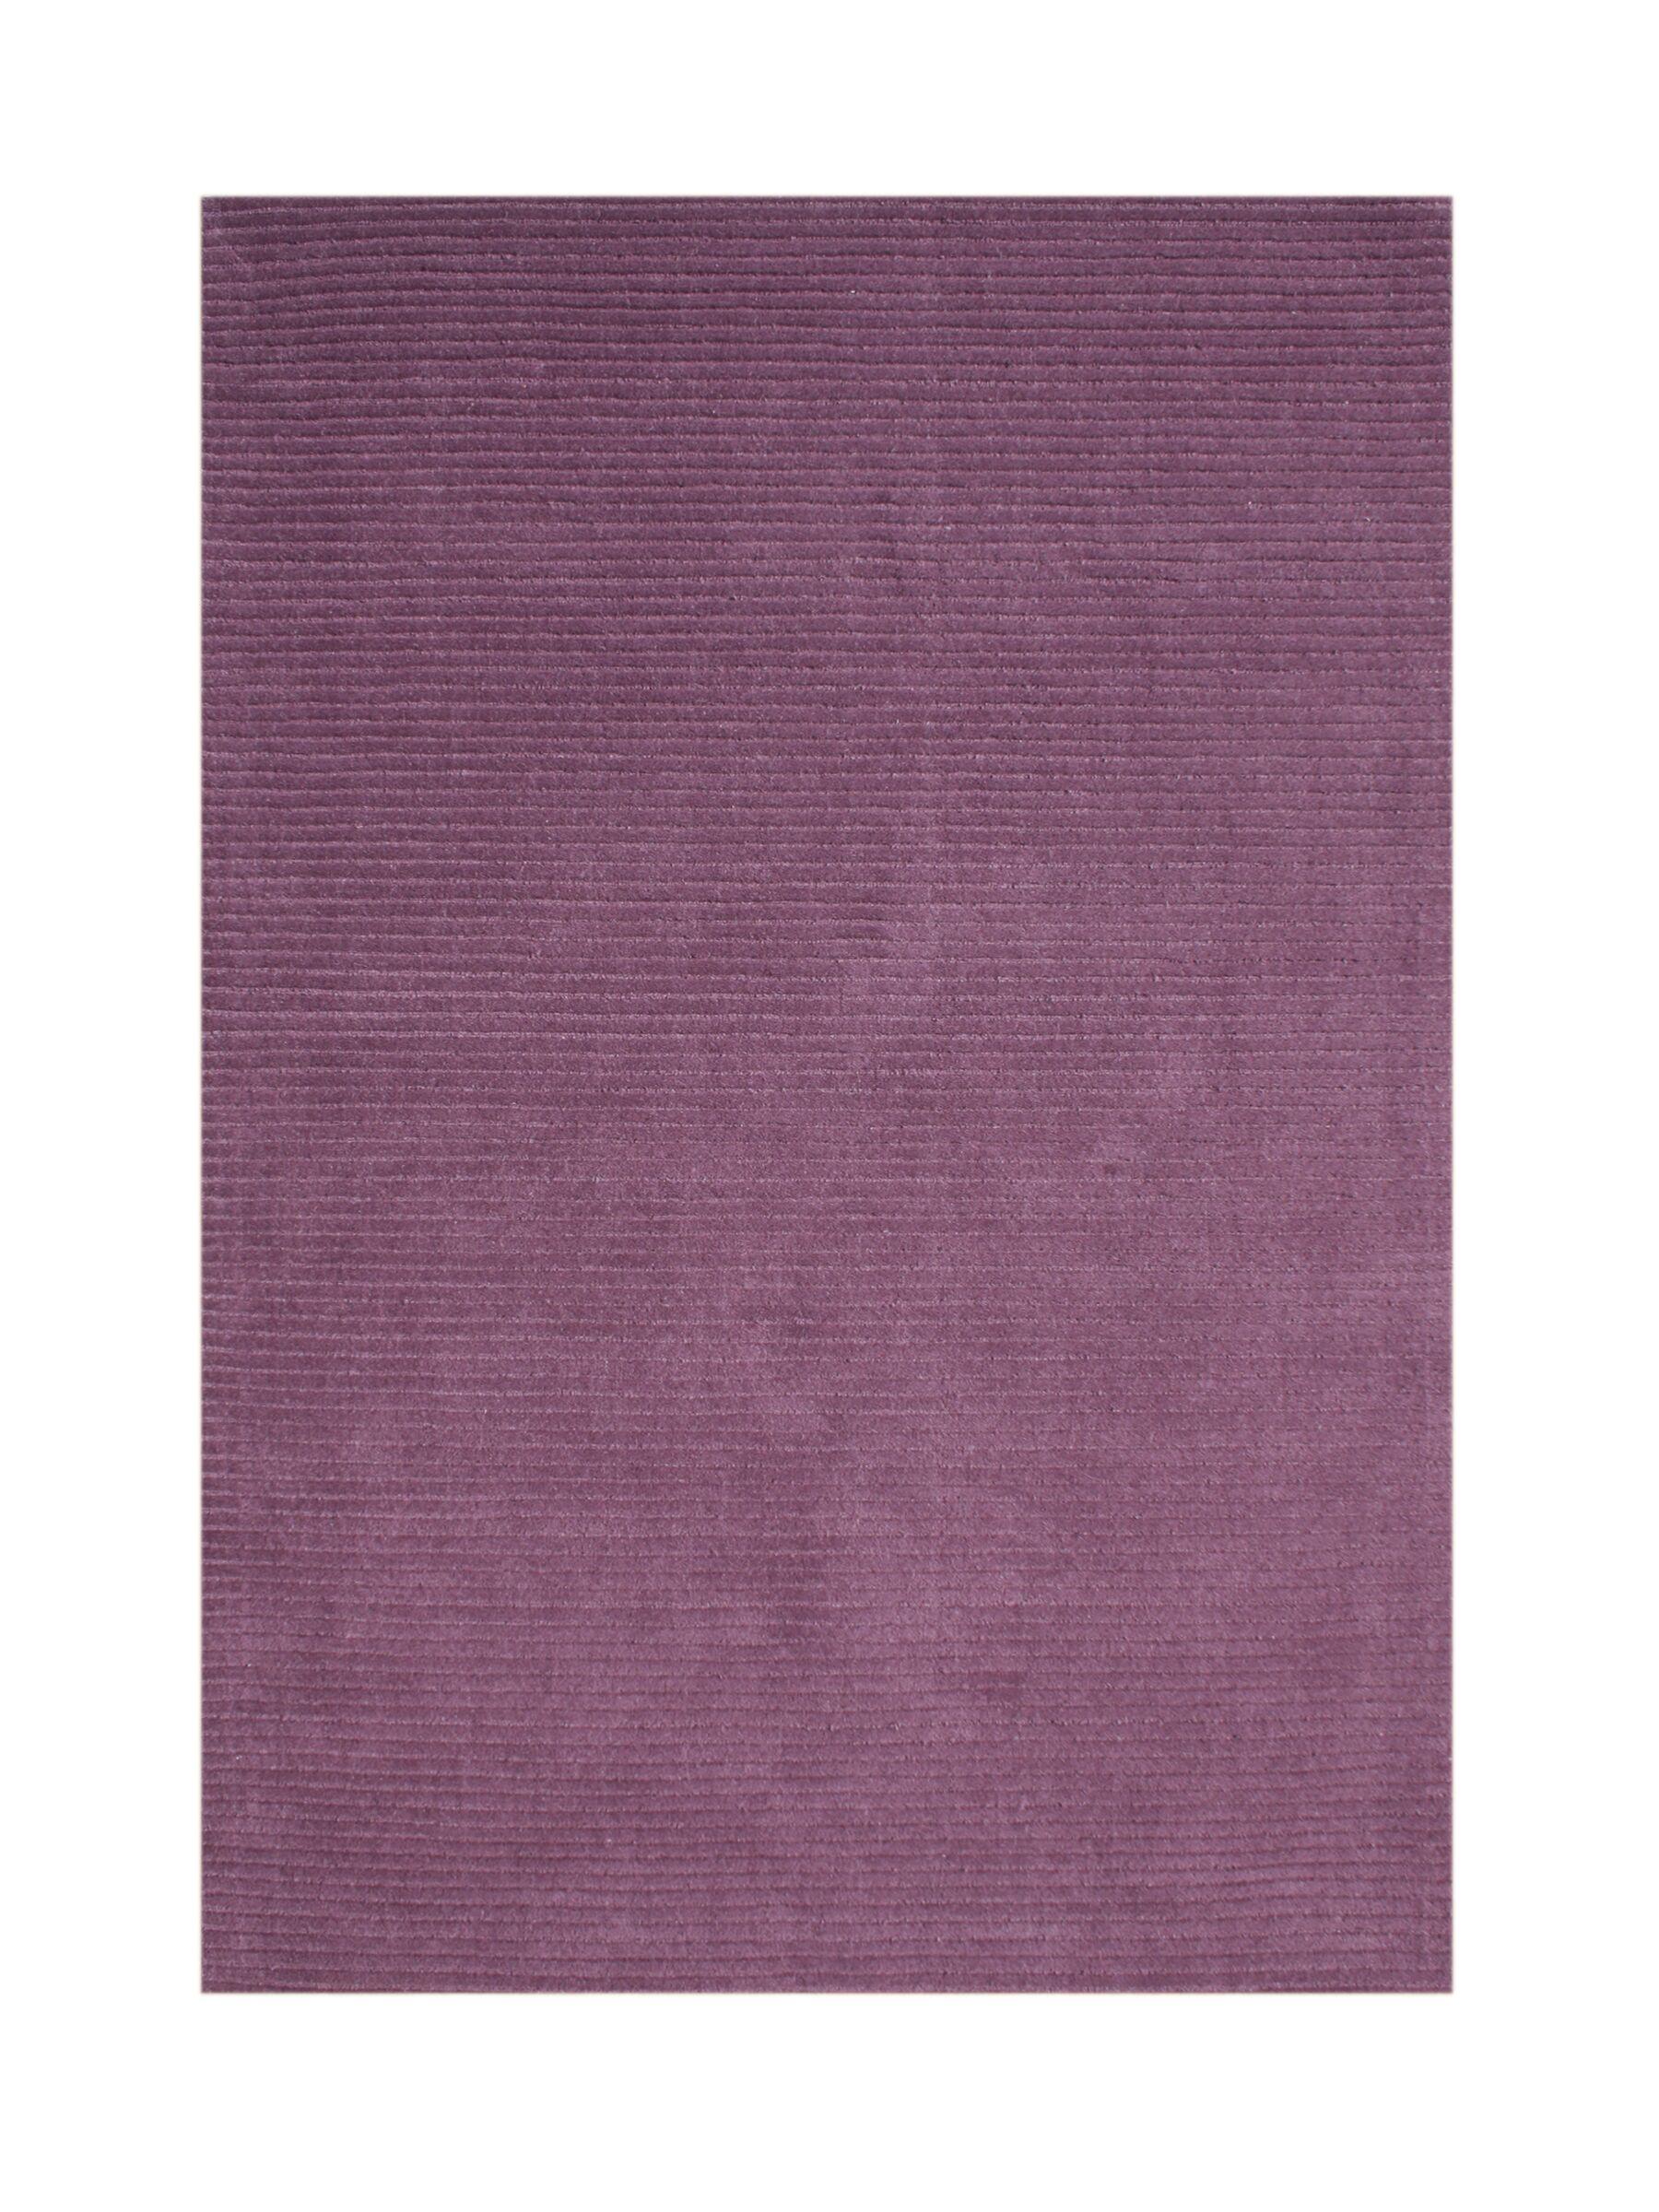 Boise Hand-Tufted Purple Area Rug